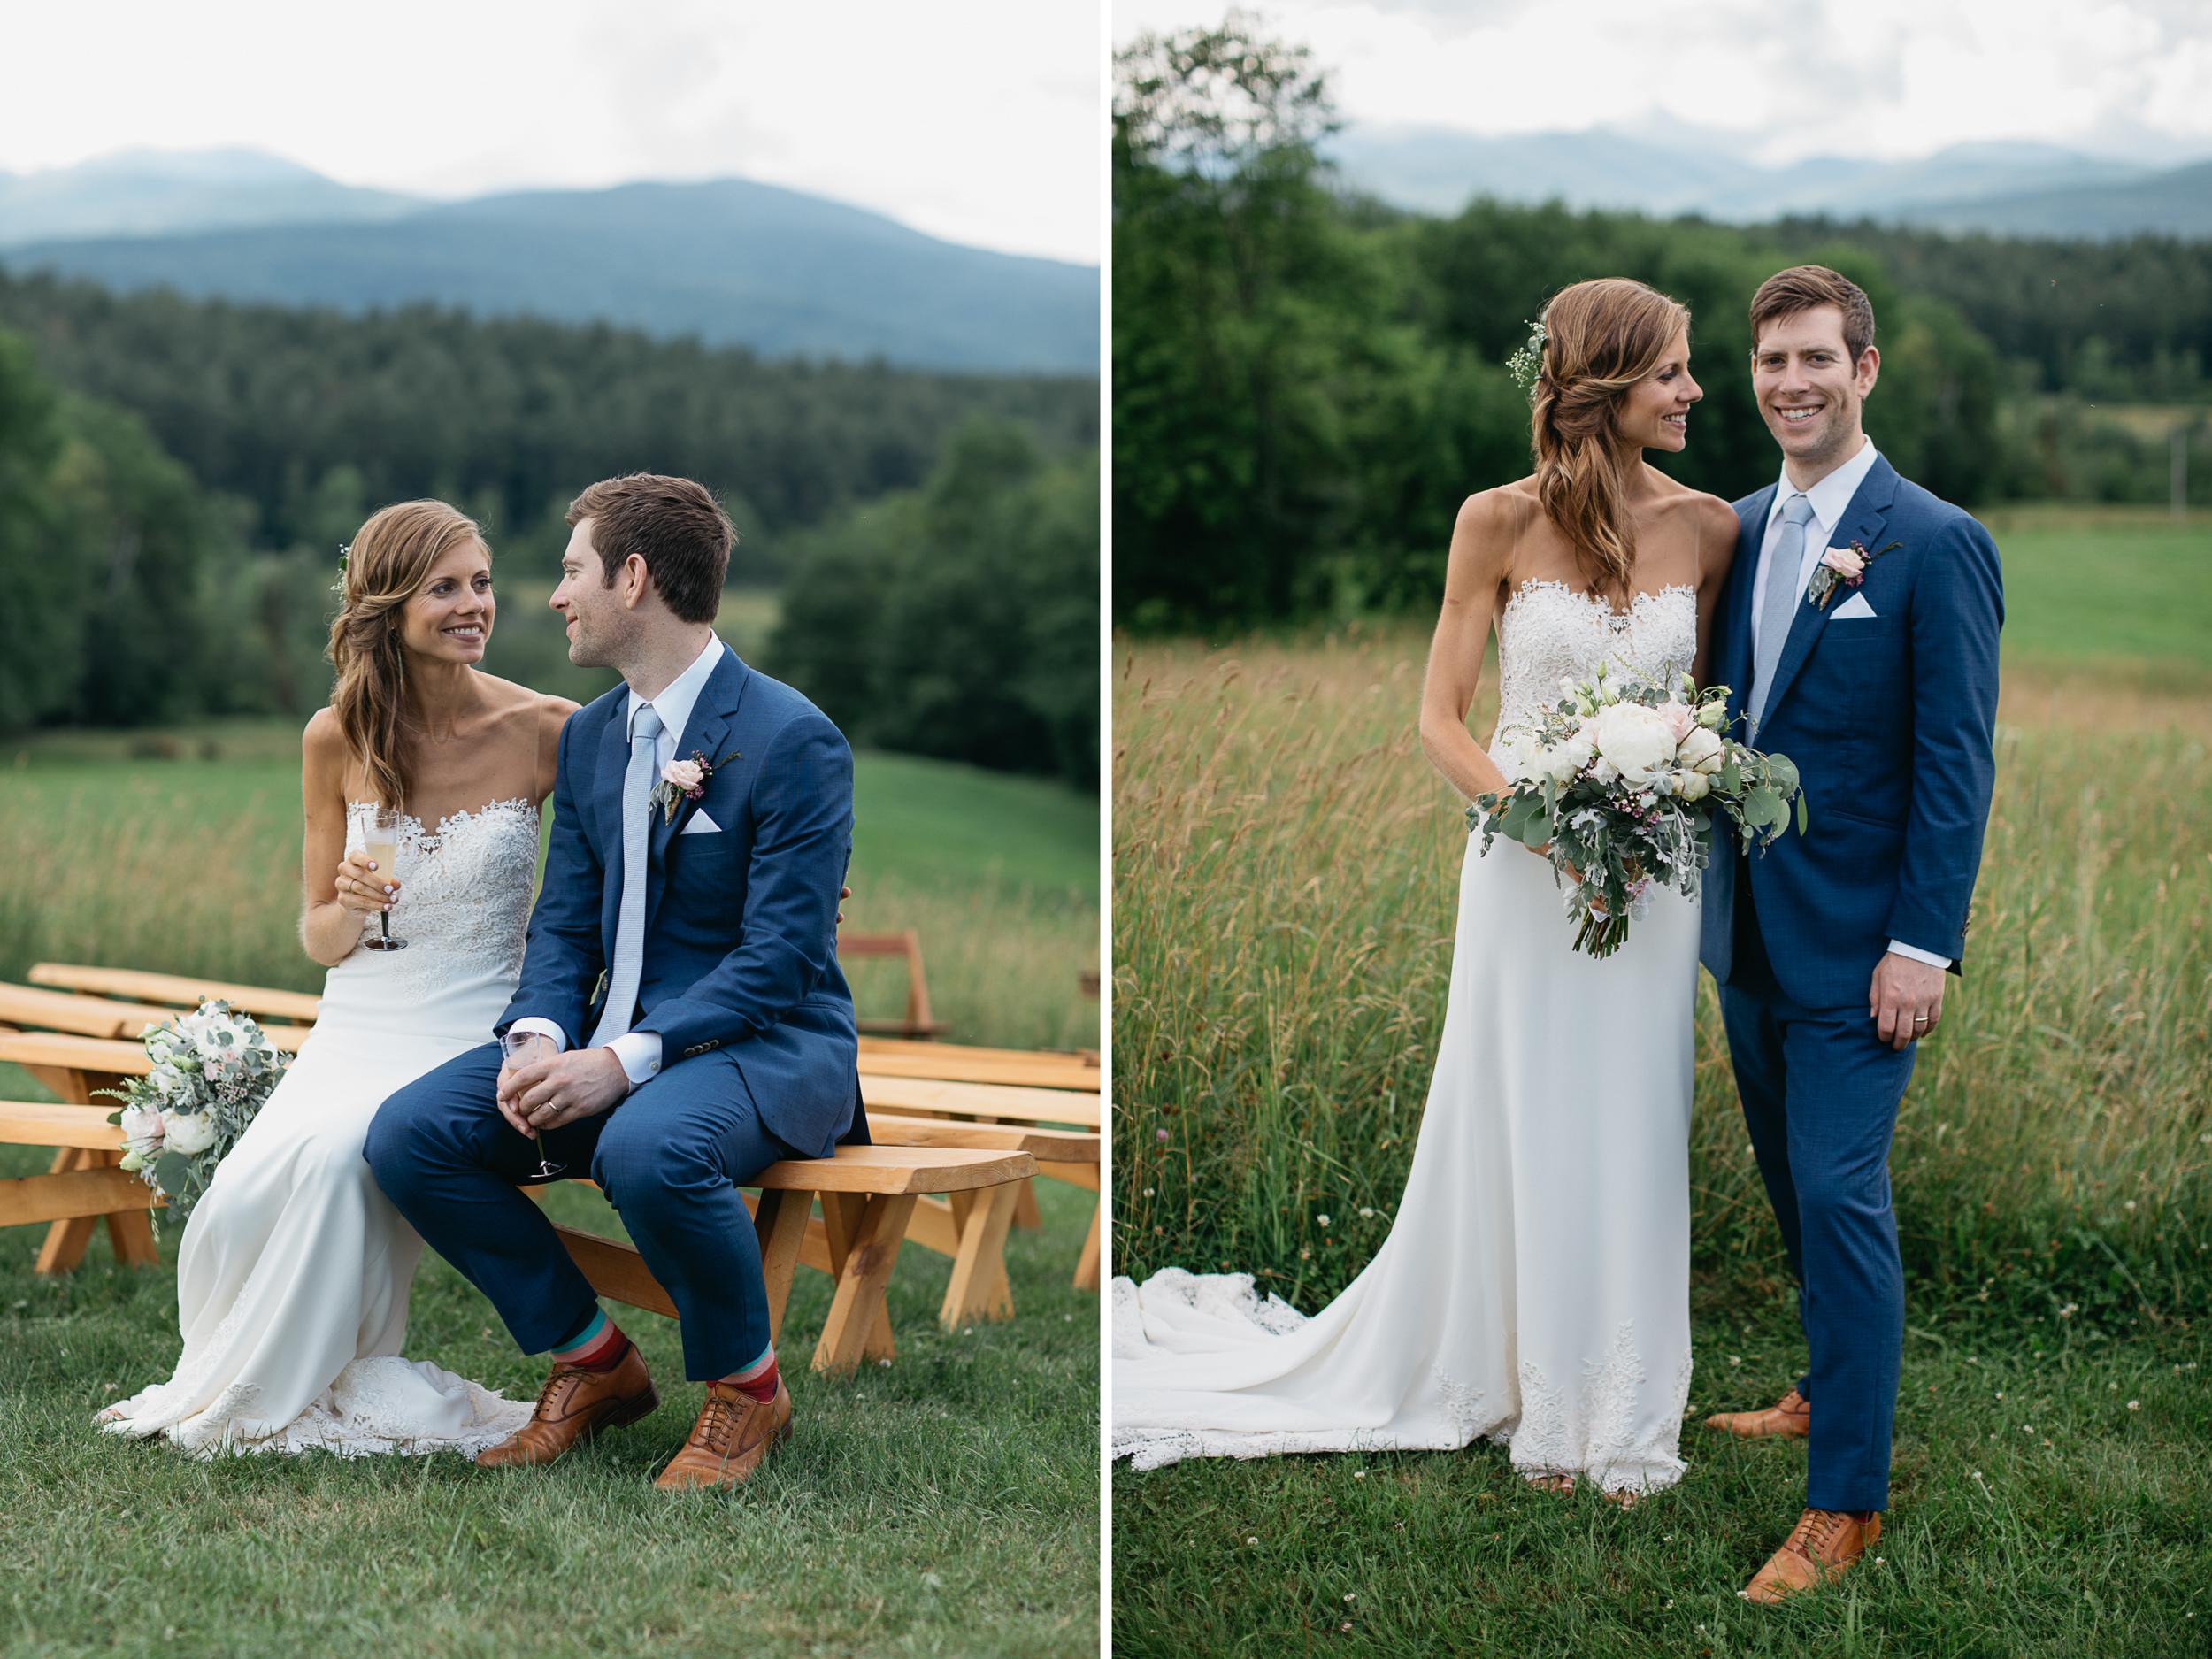 Karen_Alex_Bliss_ridge_farm_Vermont_wedding021.jpg